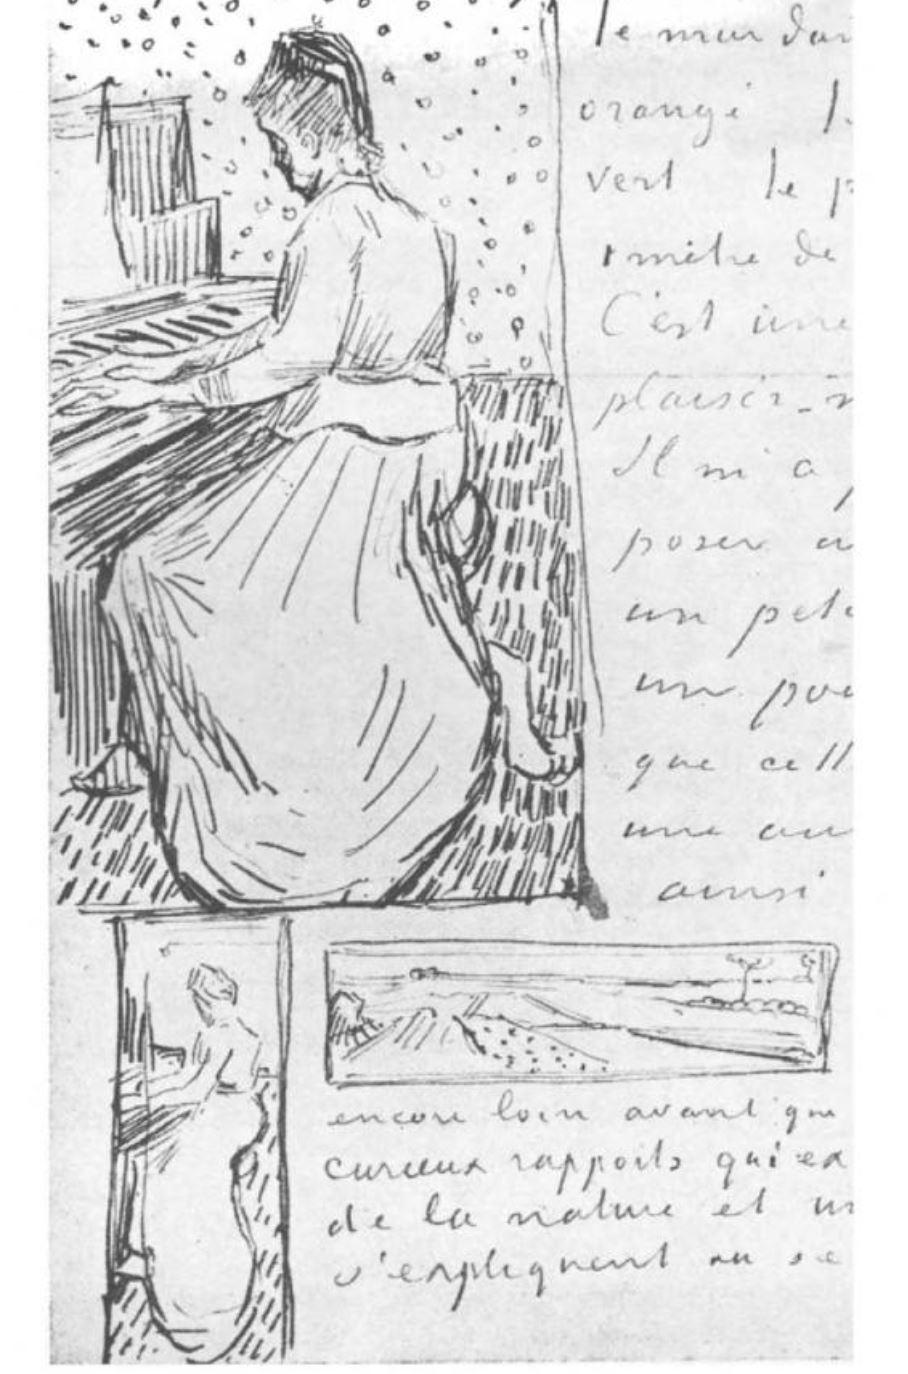 Van Gogh 1890 Lettre a Theo 24 juin